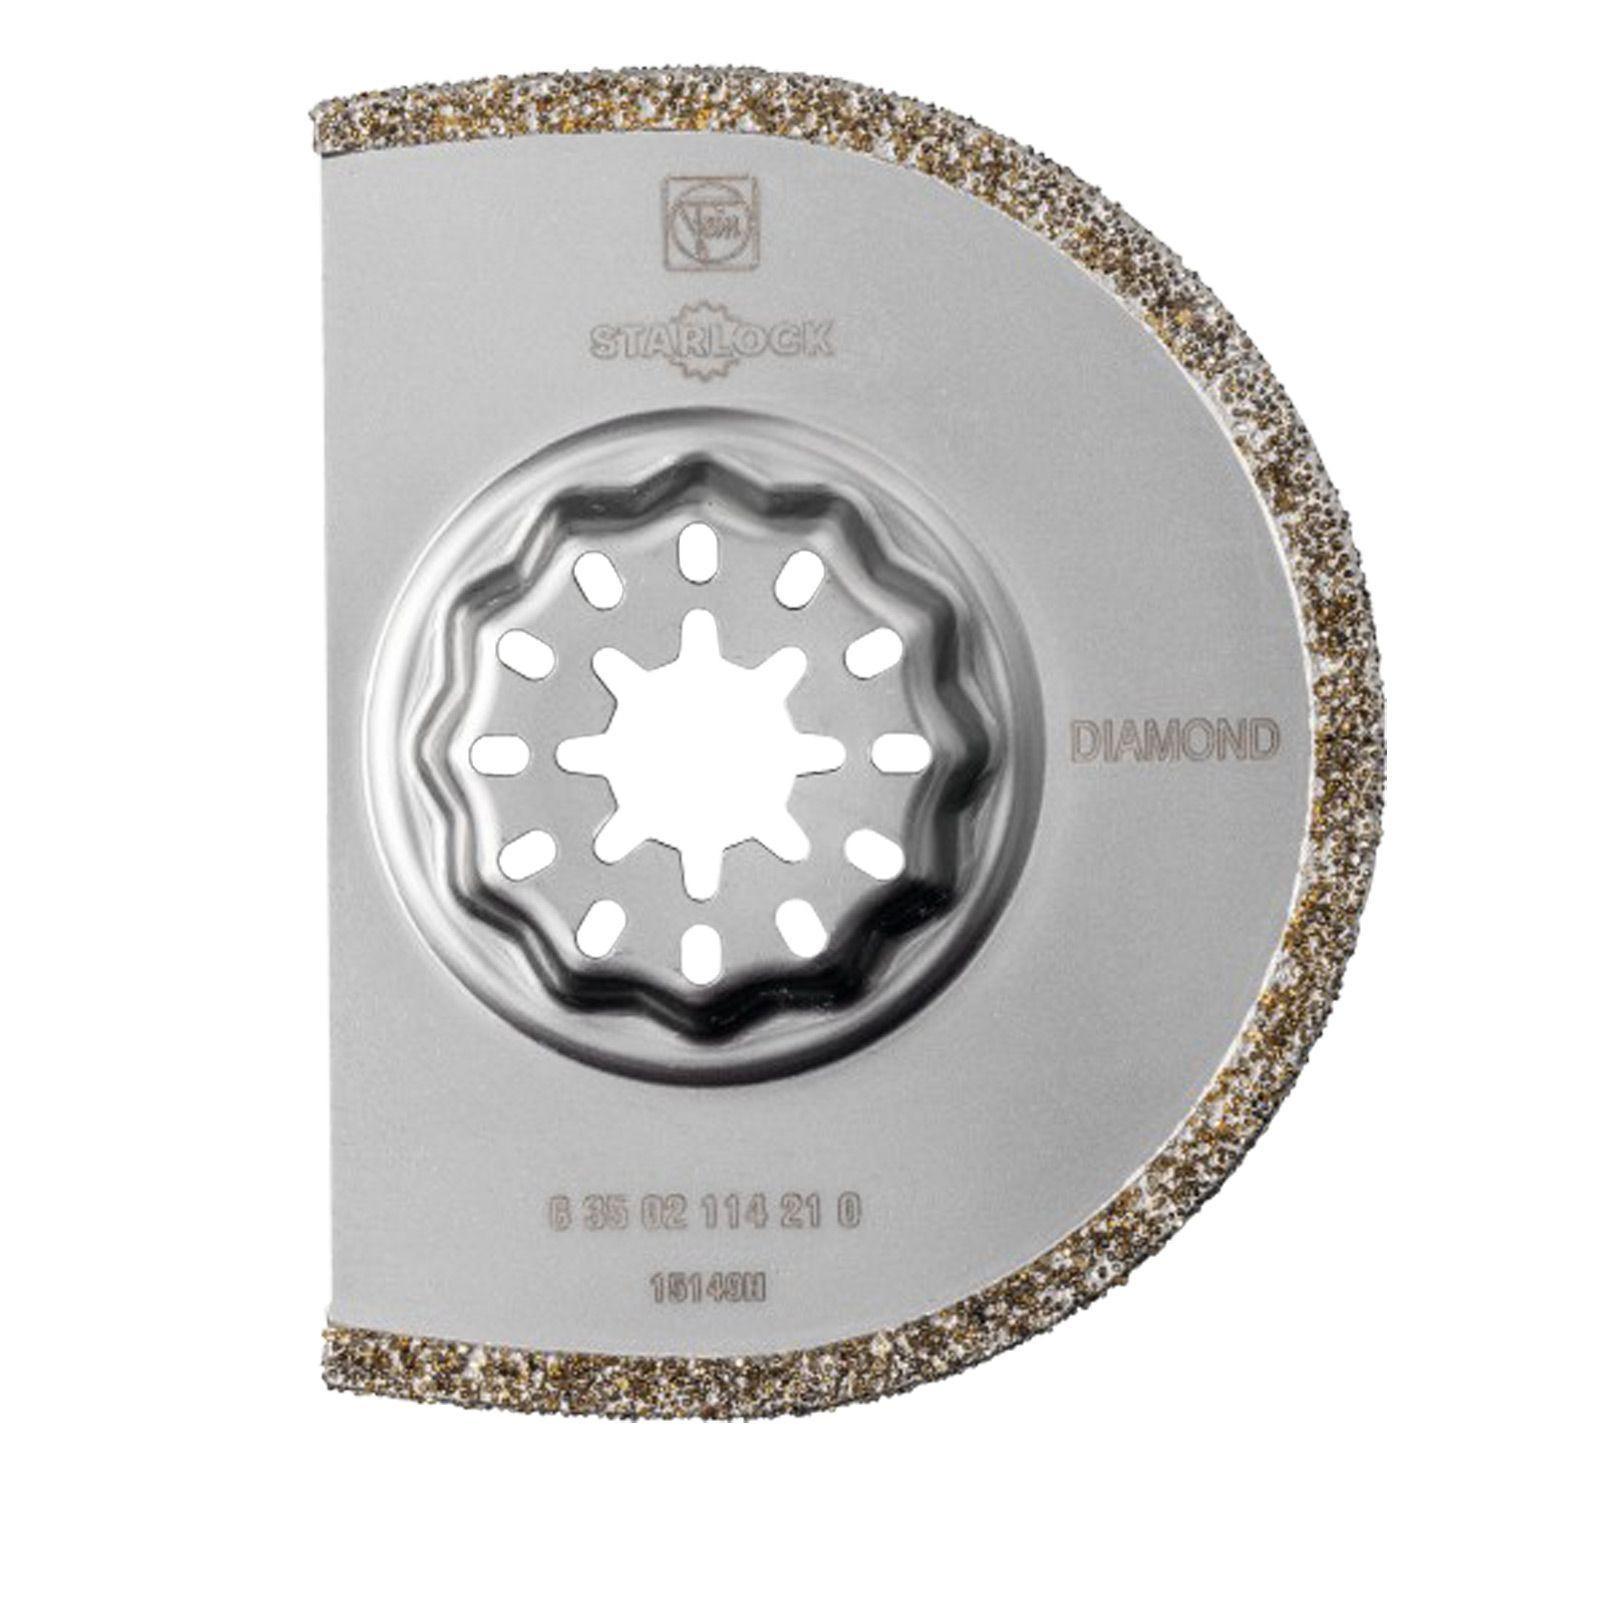 fein multimaster 1x diamant s geblatt 75mm sl 63502114210 werkzeugstore24. Black Bedroom Furniture Sets. Home Design Ideas